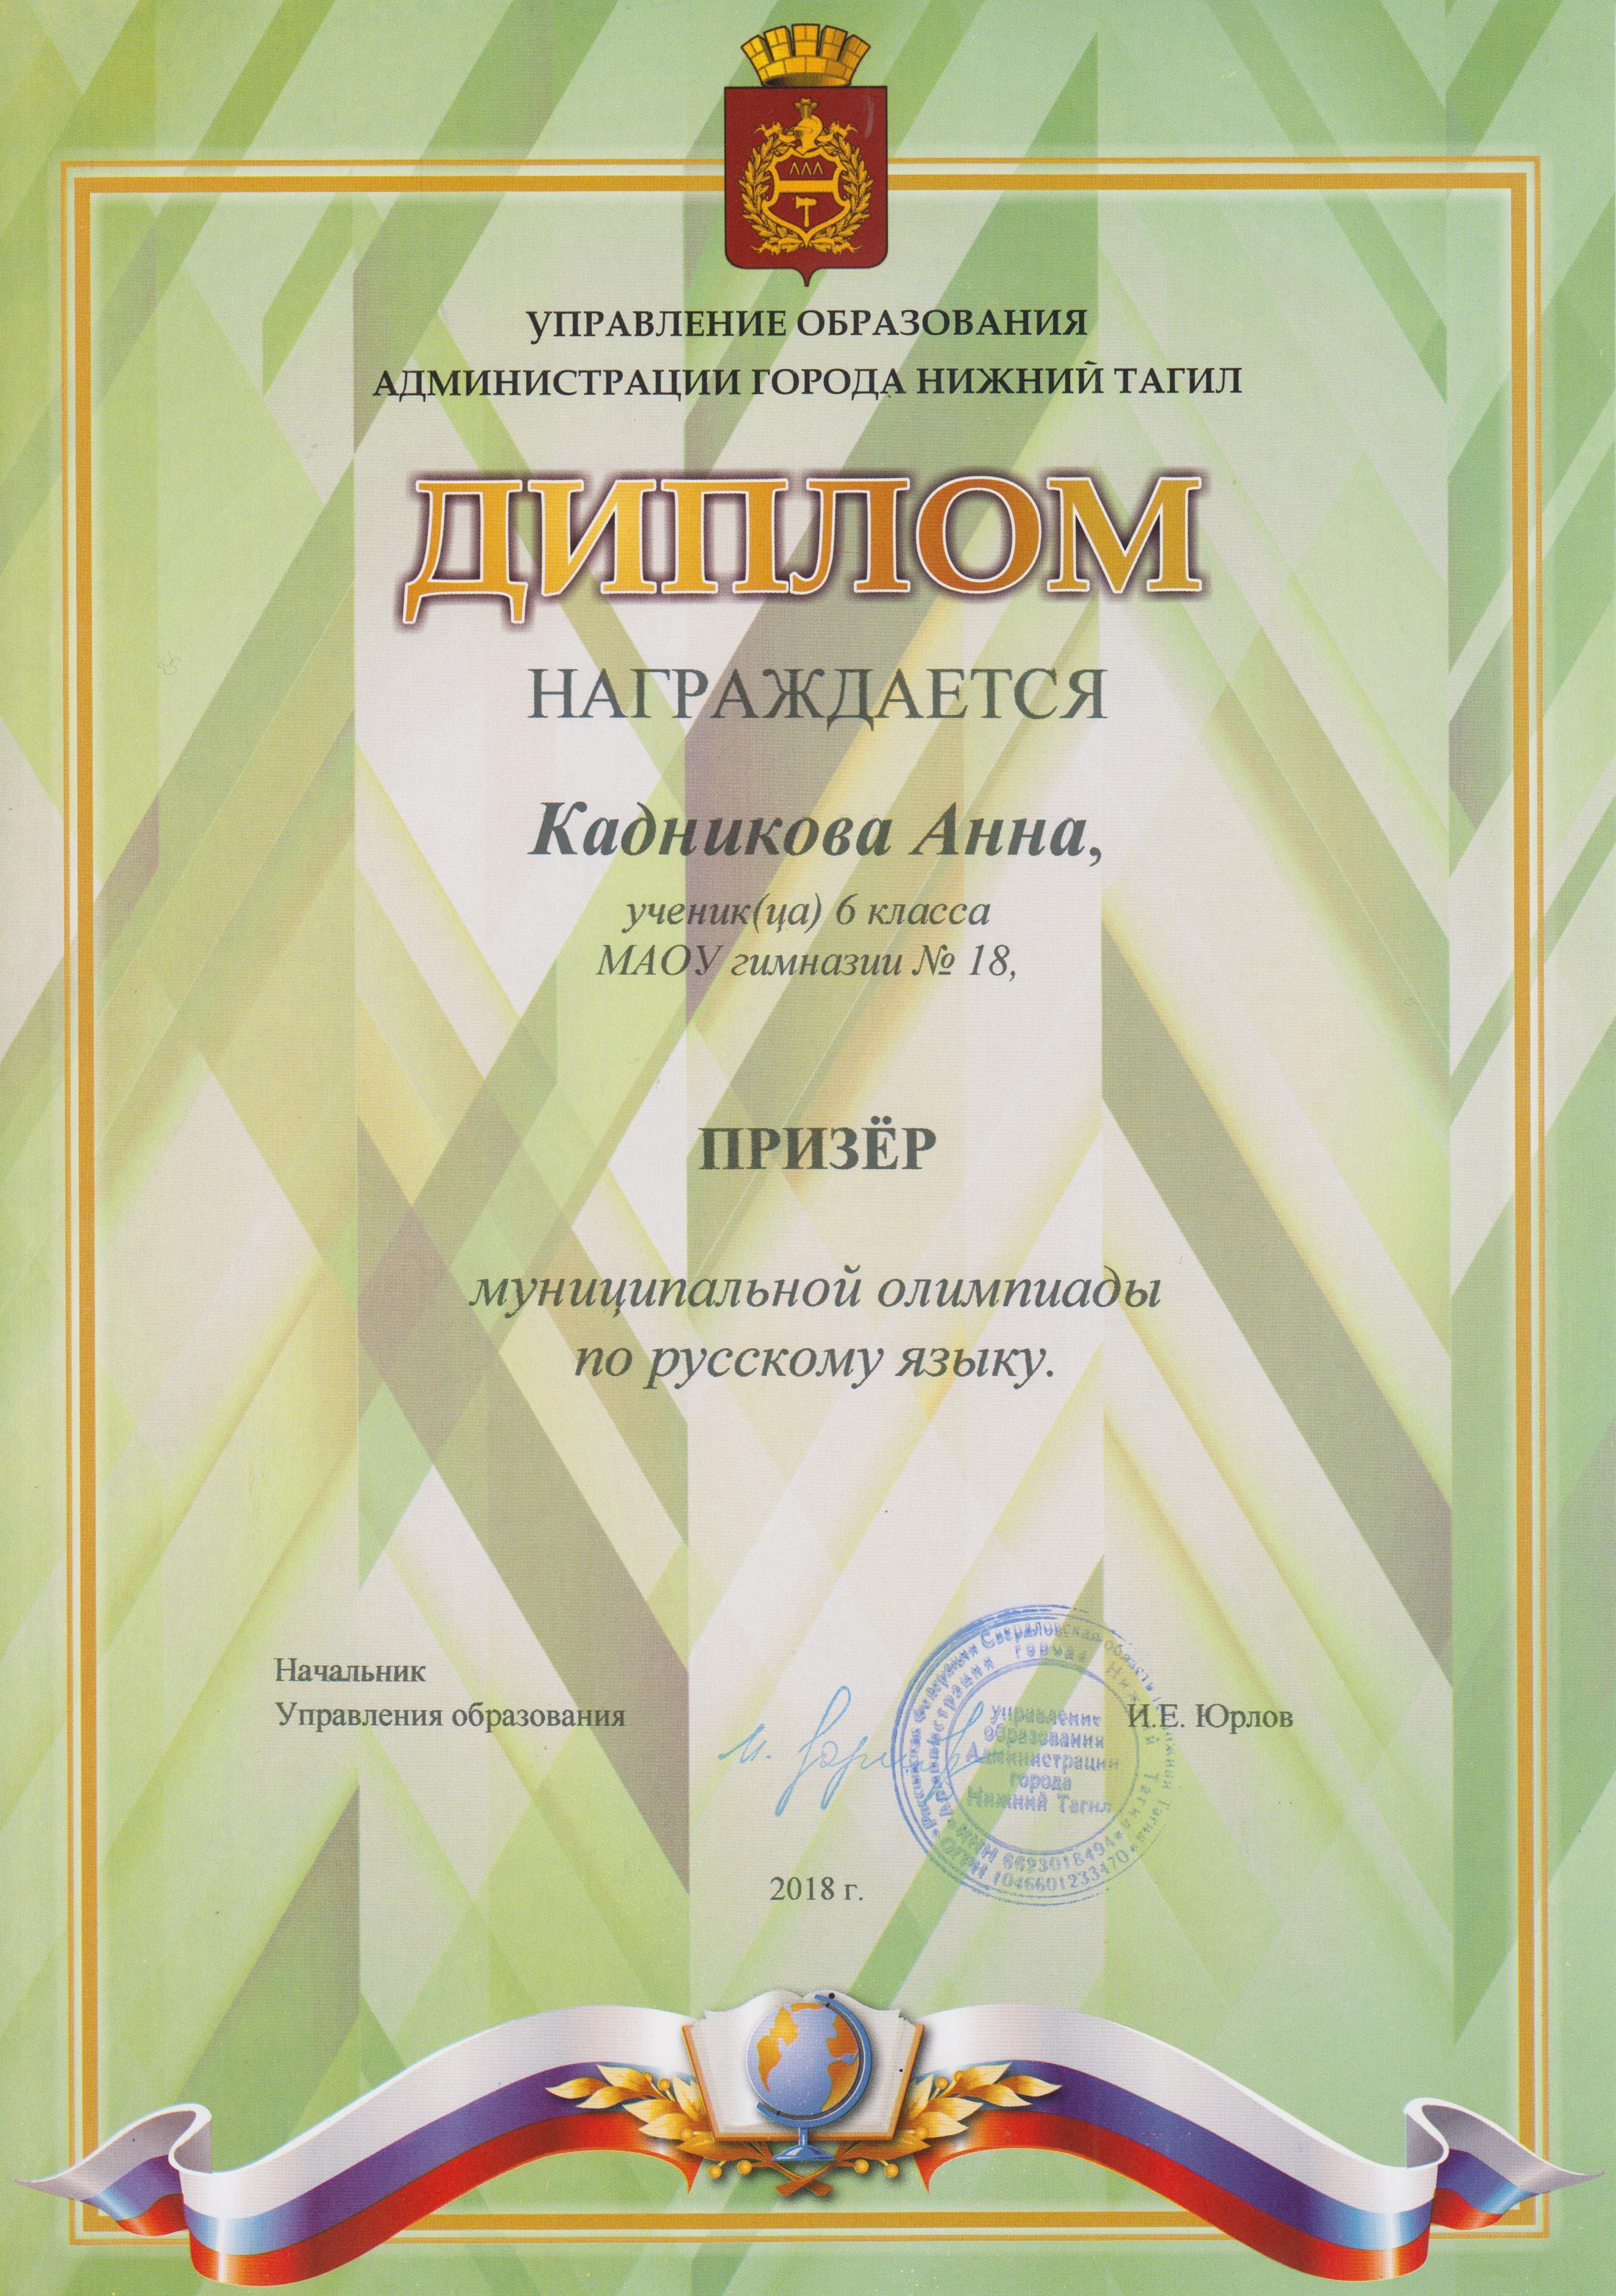 Ол. РЯ. Кадникова. 2018